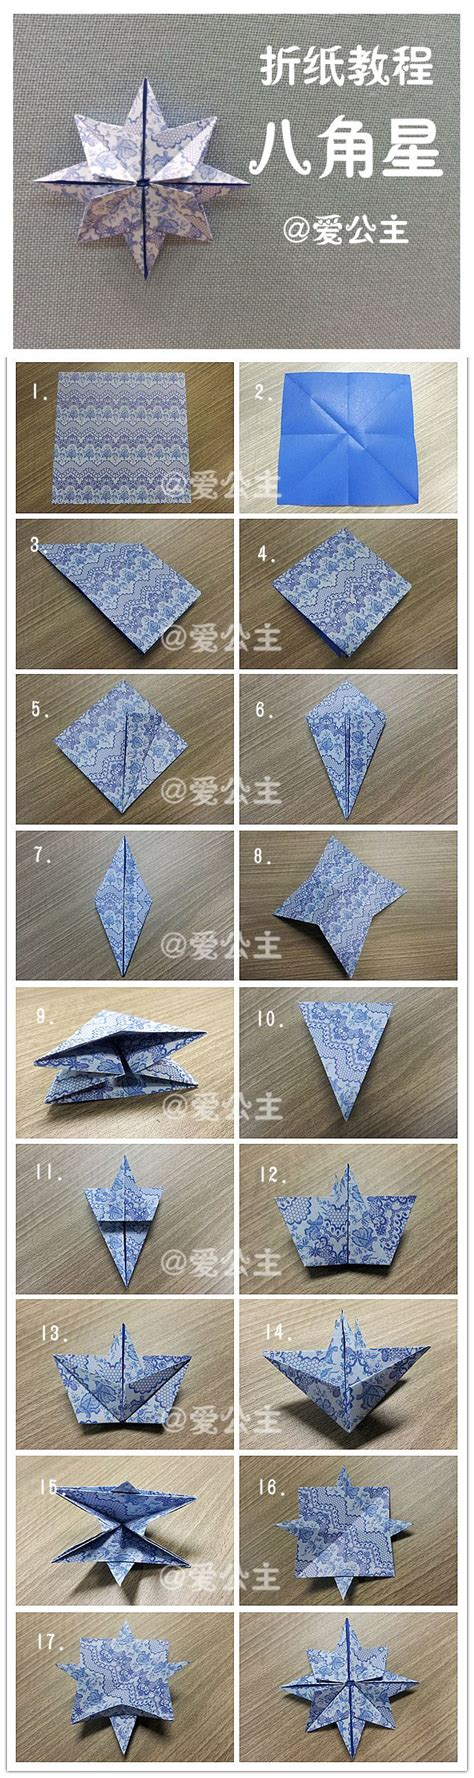 origami diy origami diy origami